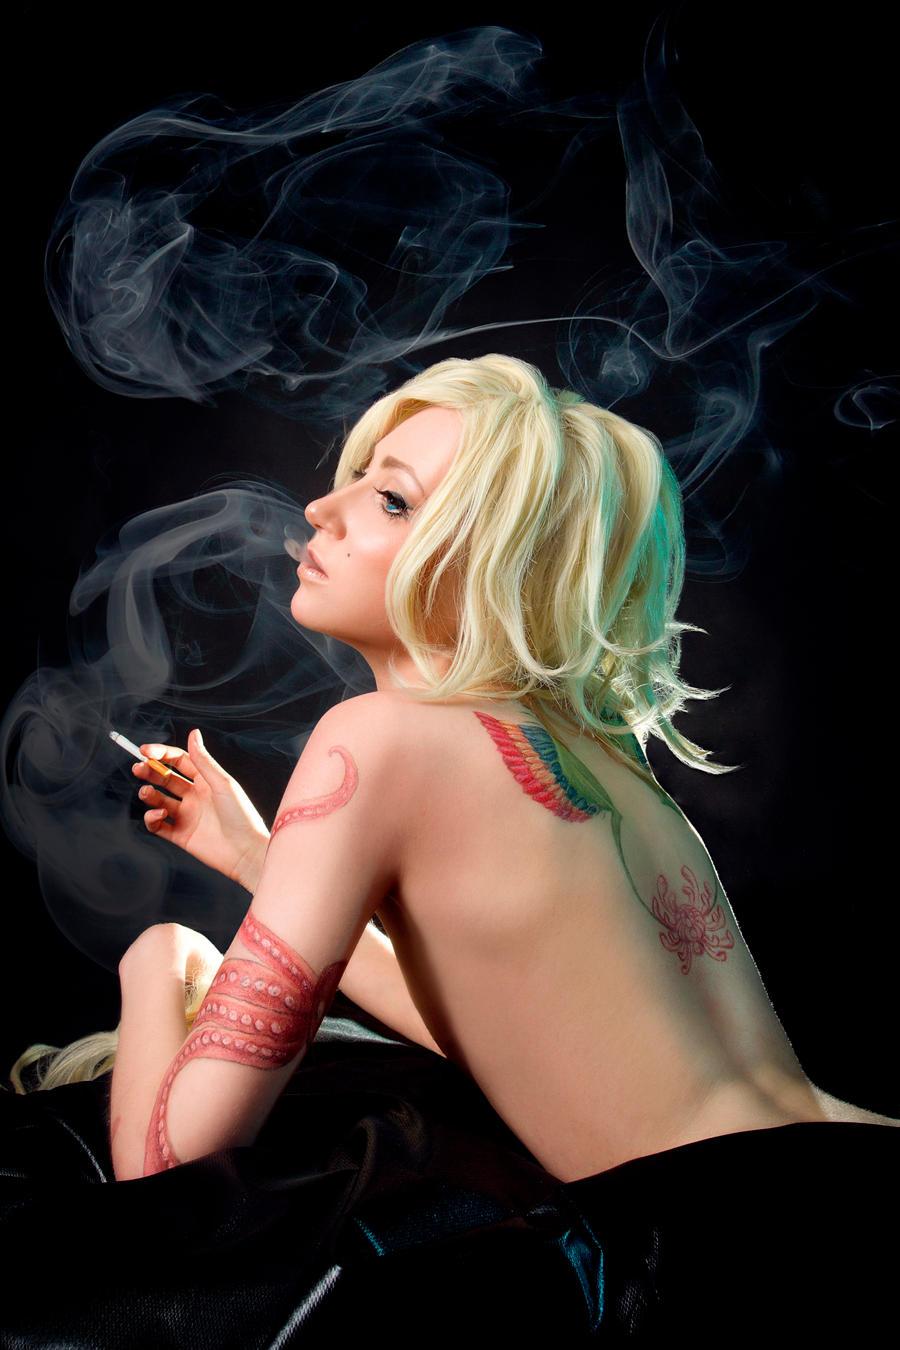 Benten  and smoke by Kurai-Kardi